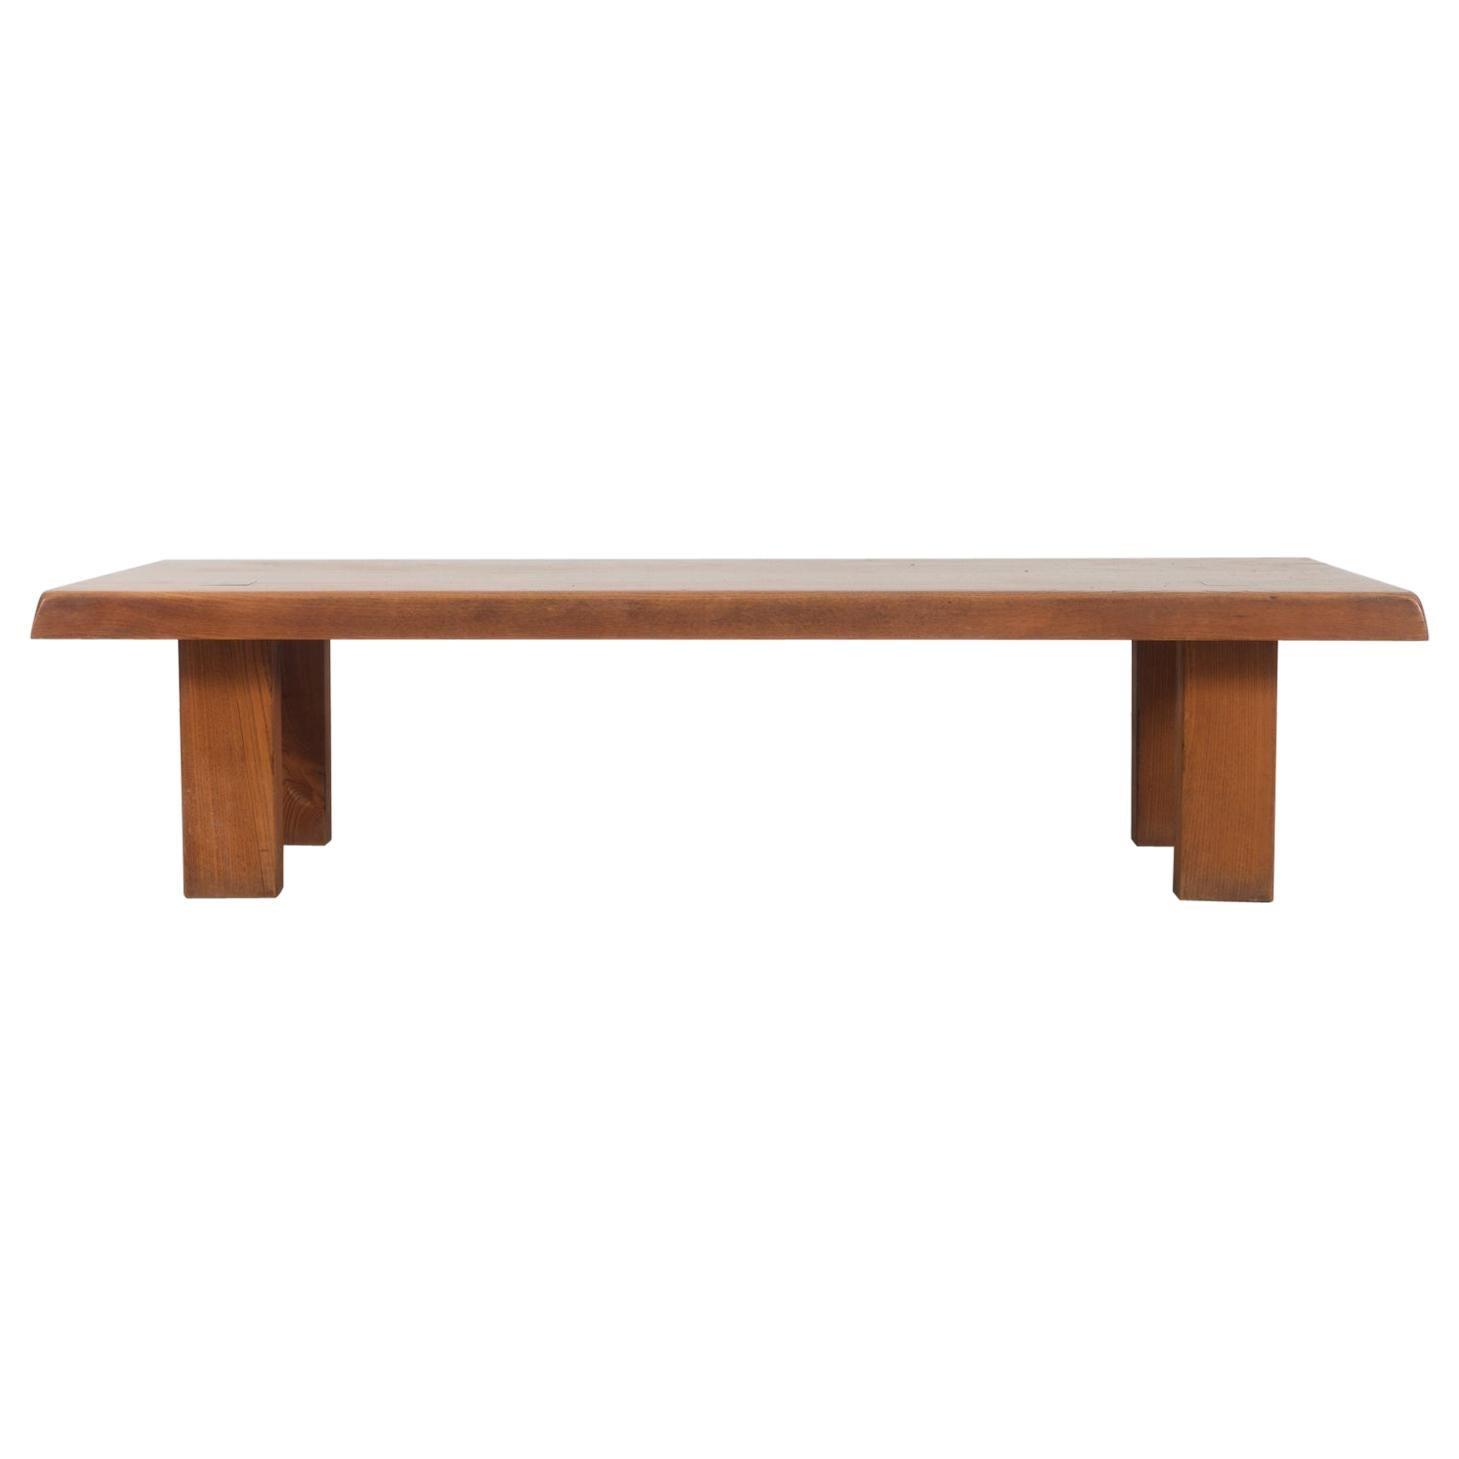 "Pierre Chapo, ""T08"" Coffee Table, circa 1965, Elm"